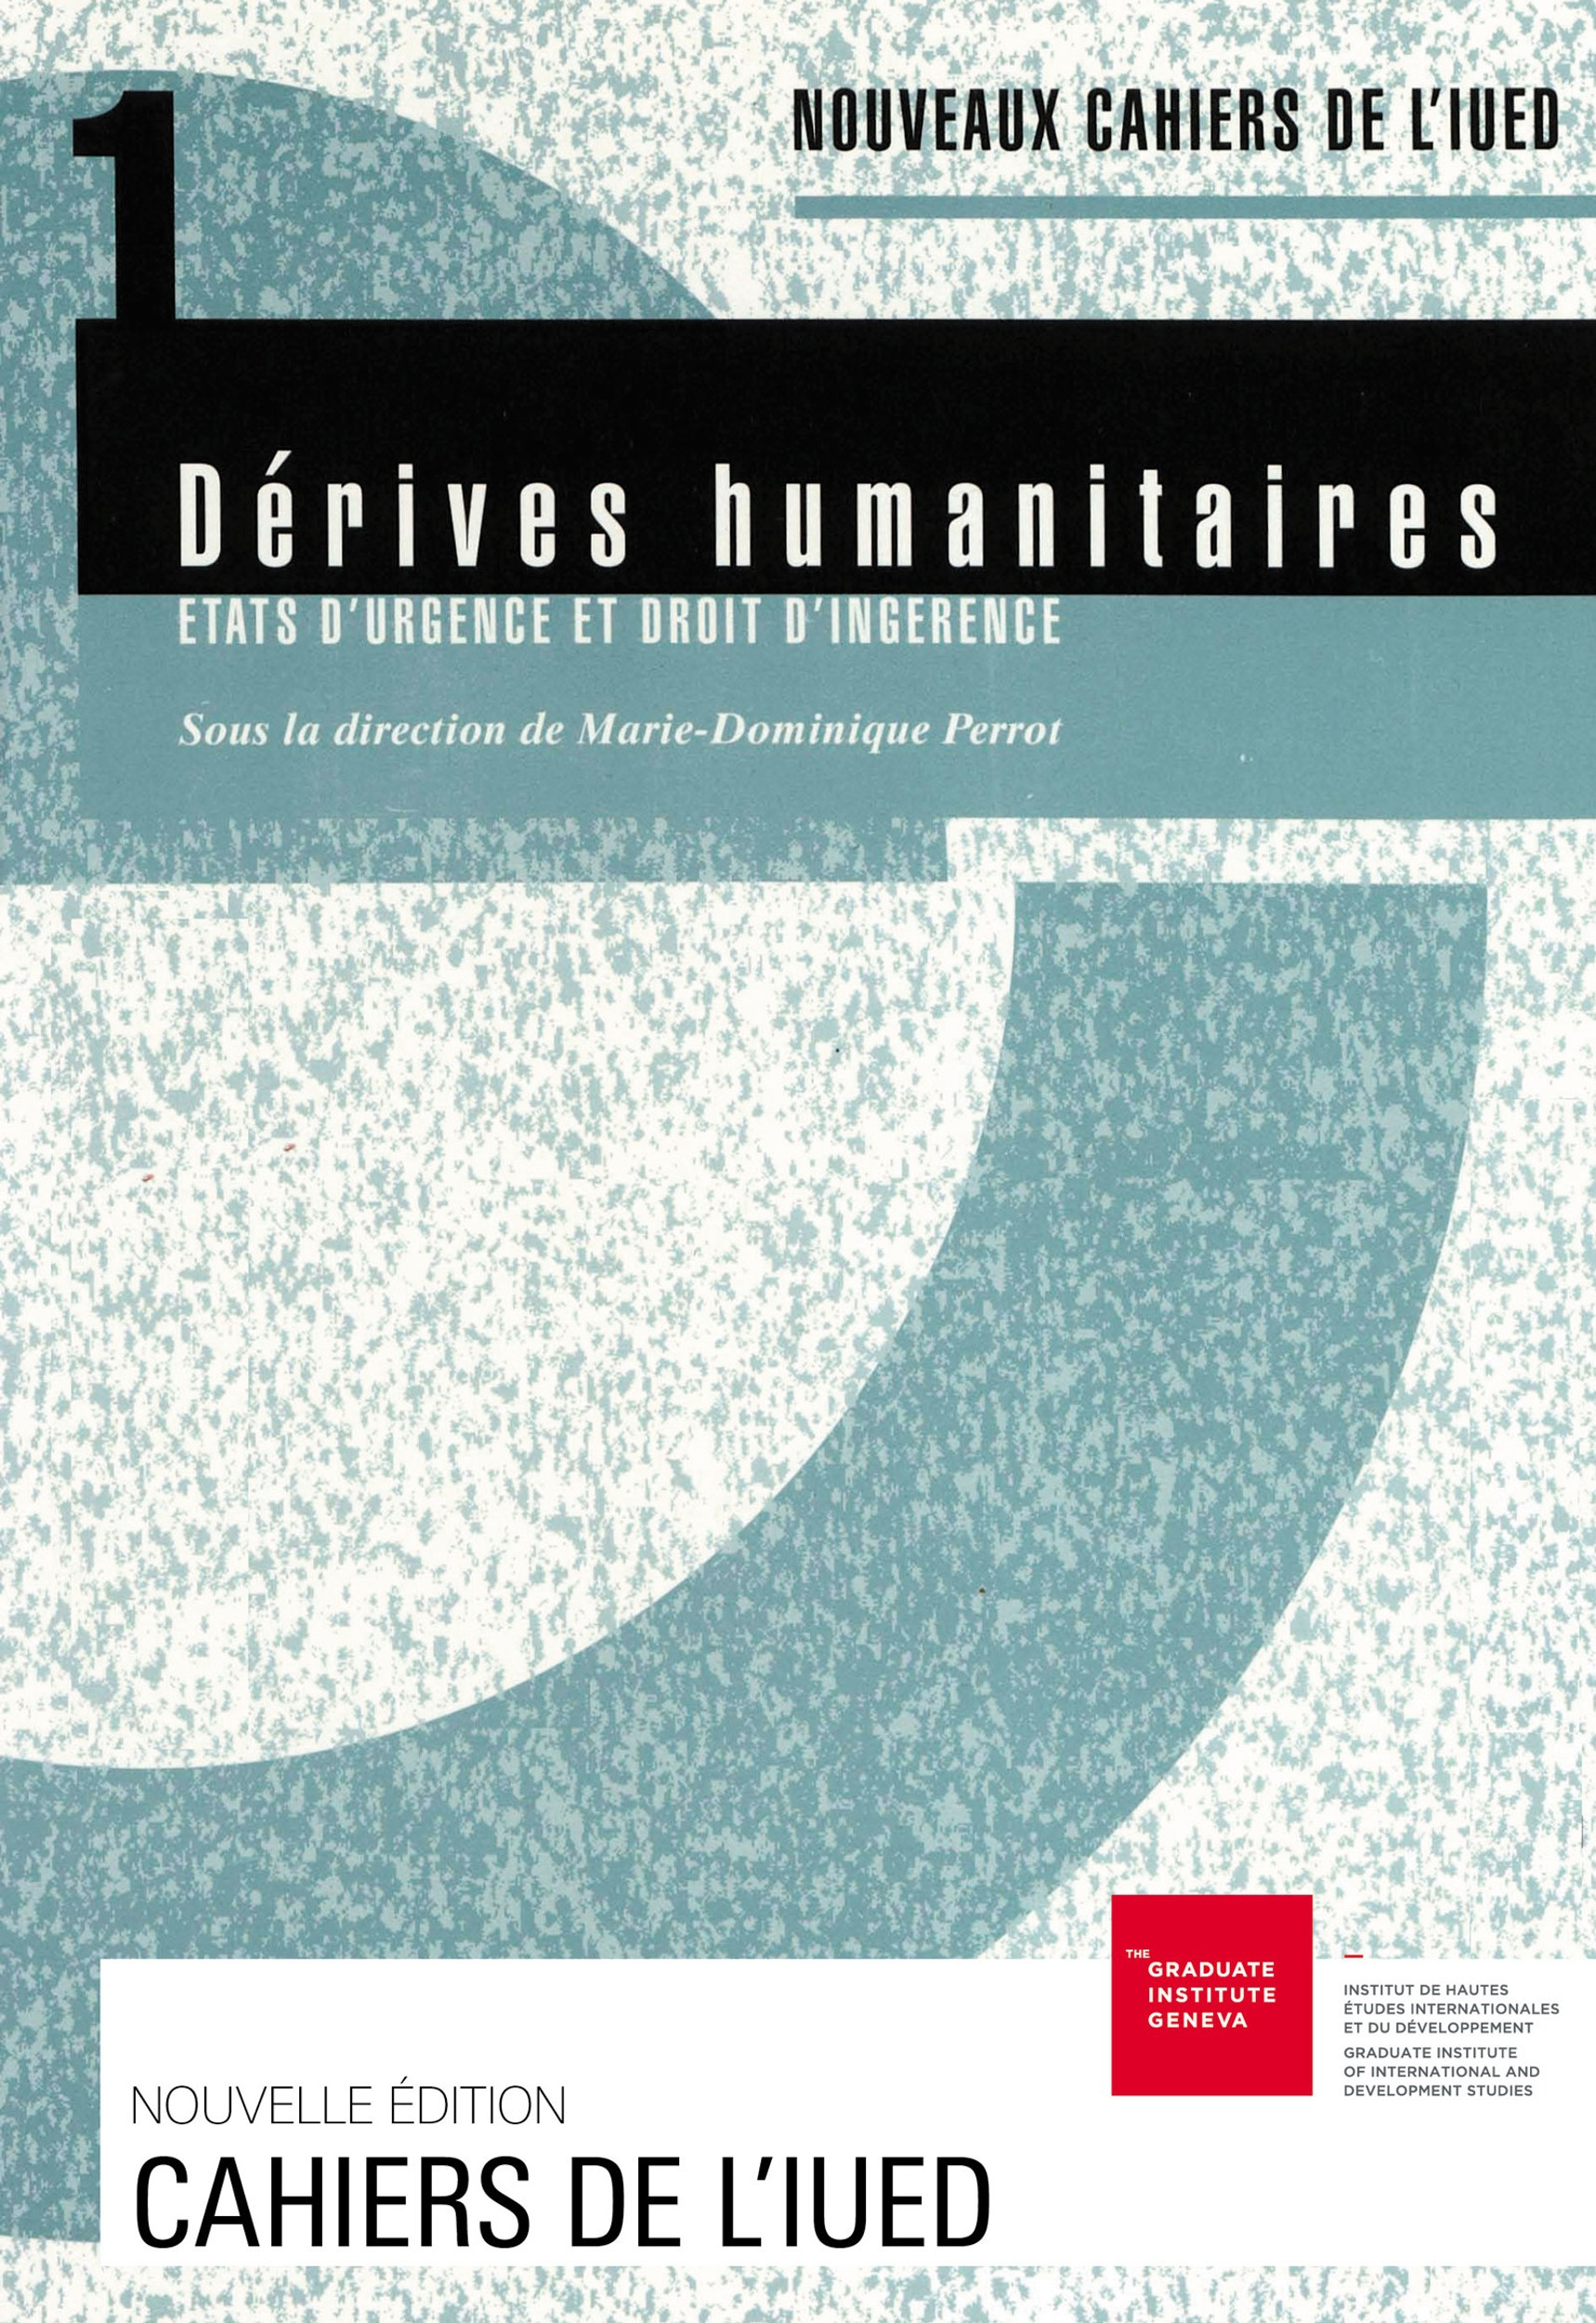 Derives humanitaires